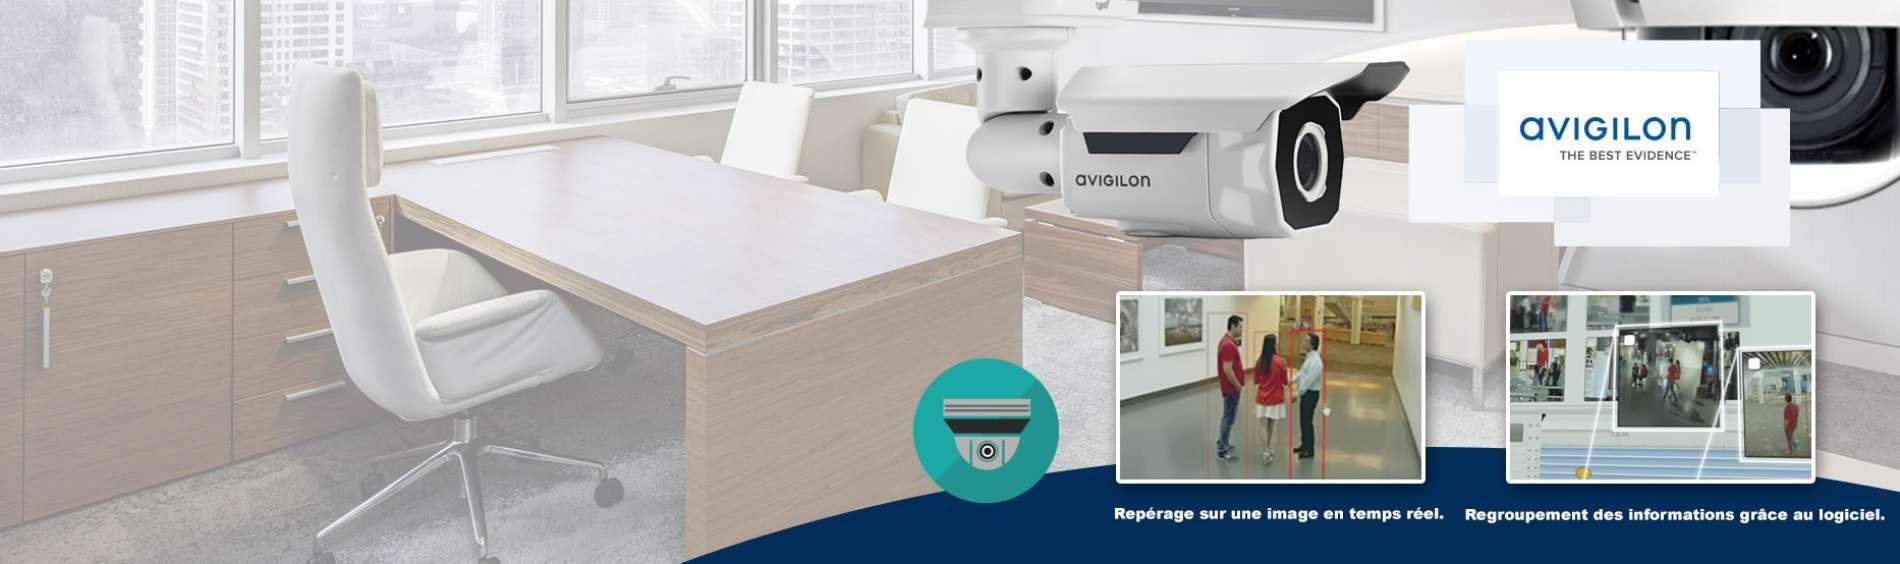 NEW Avigilon <br>Appearance Search ™<br> Technology - Reveal